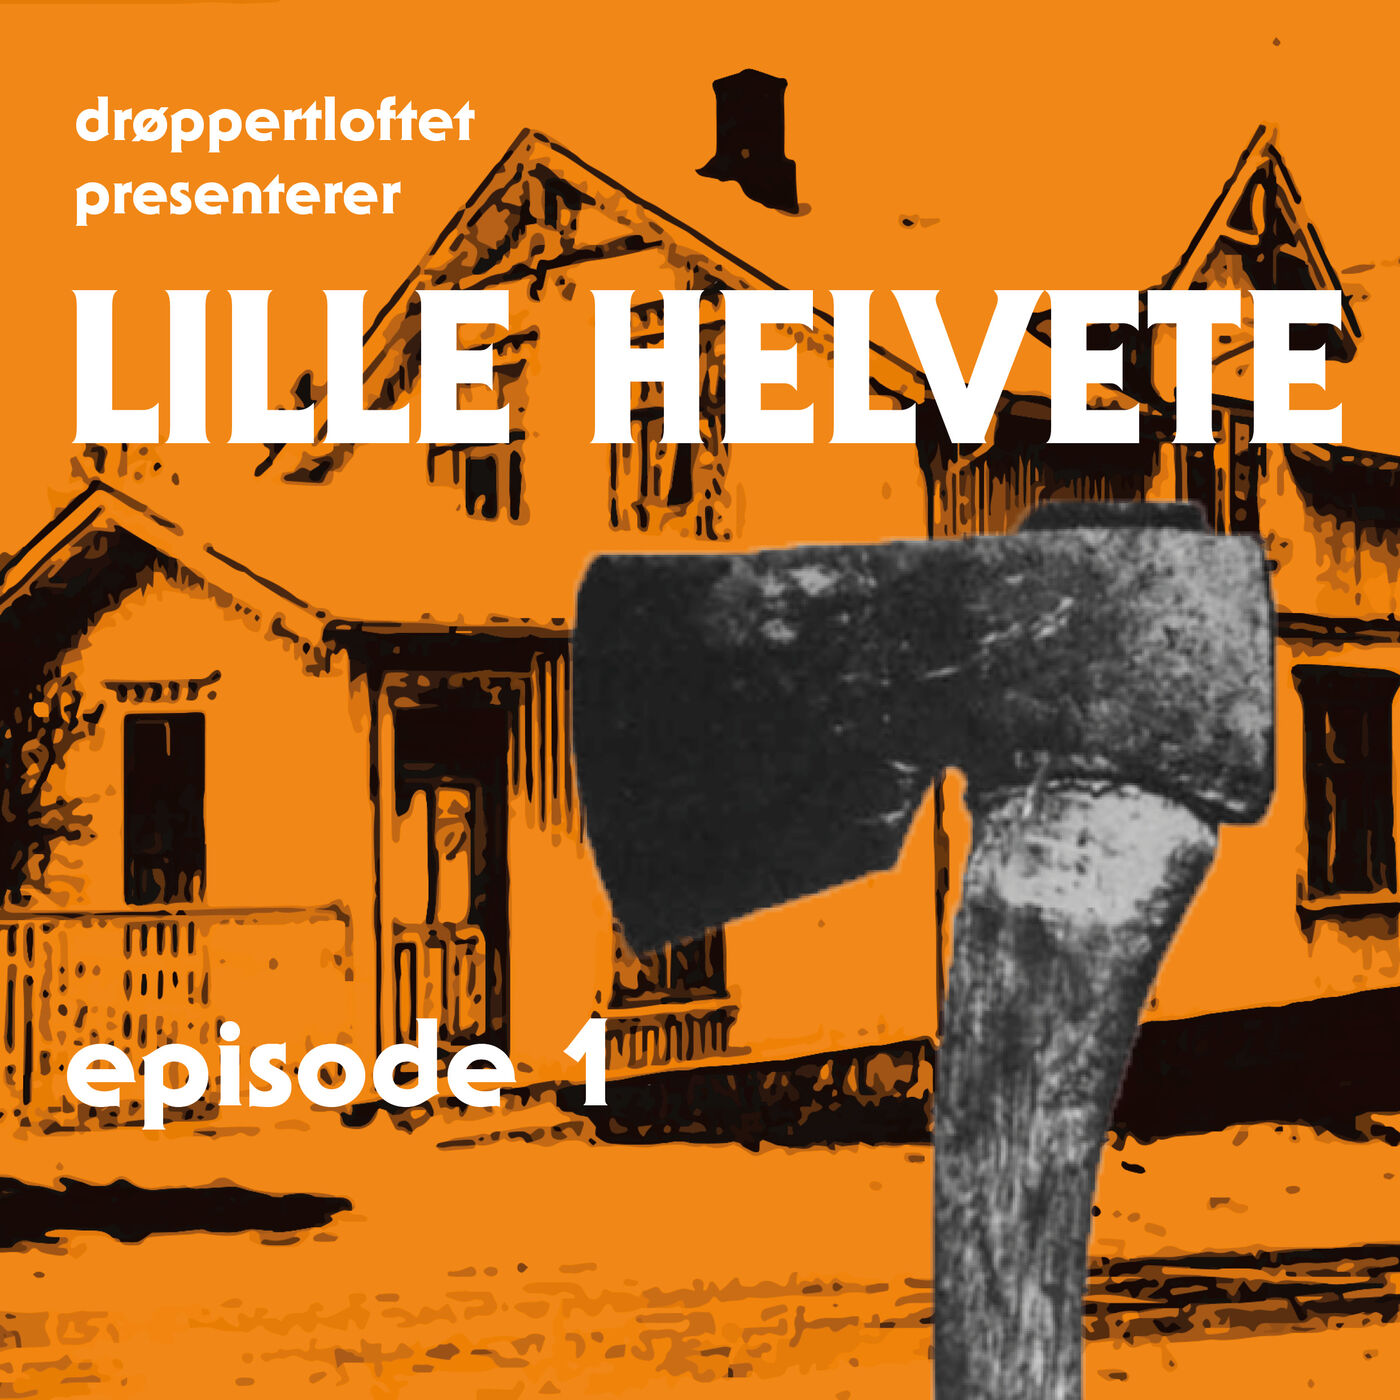 Episode 1: Lille Helvete